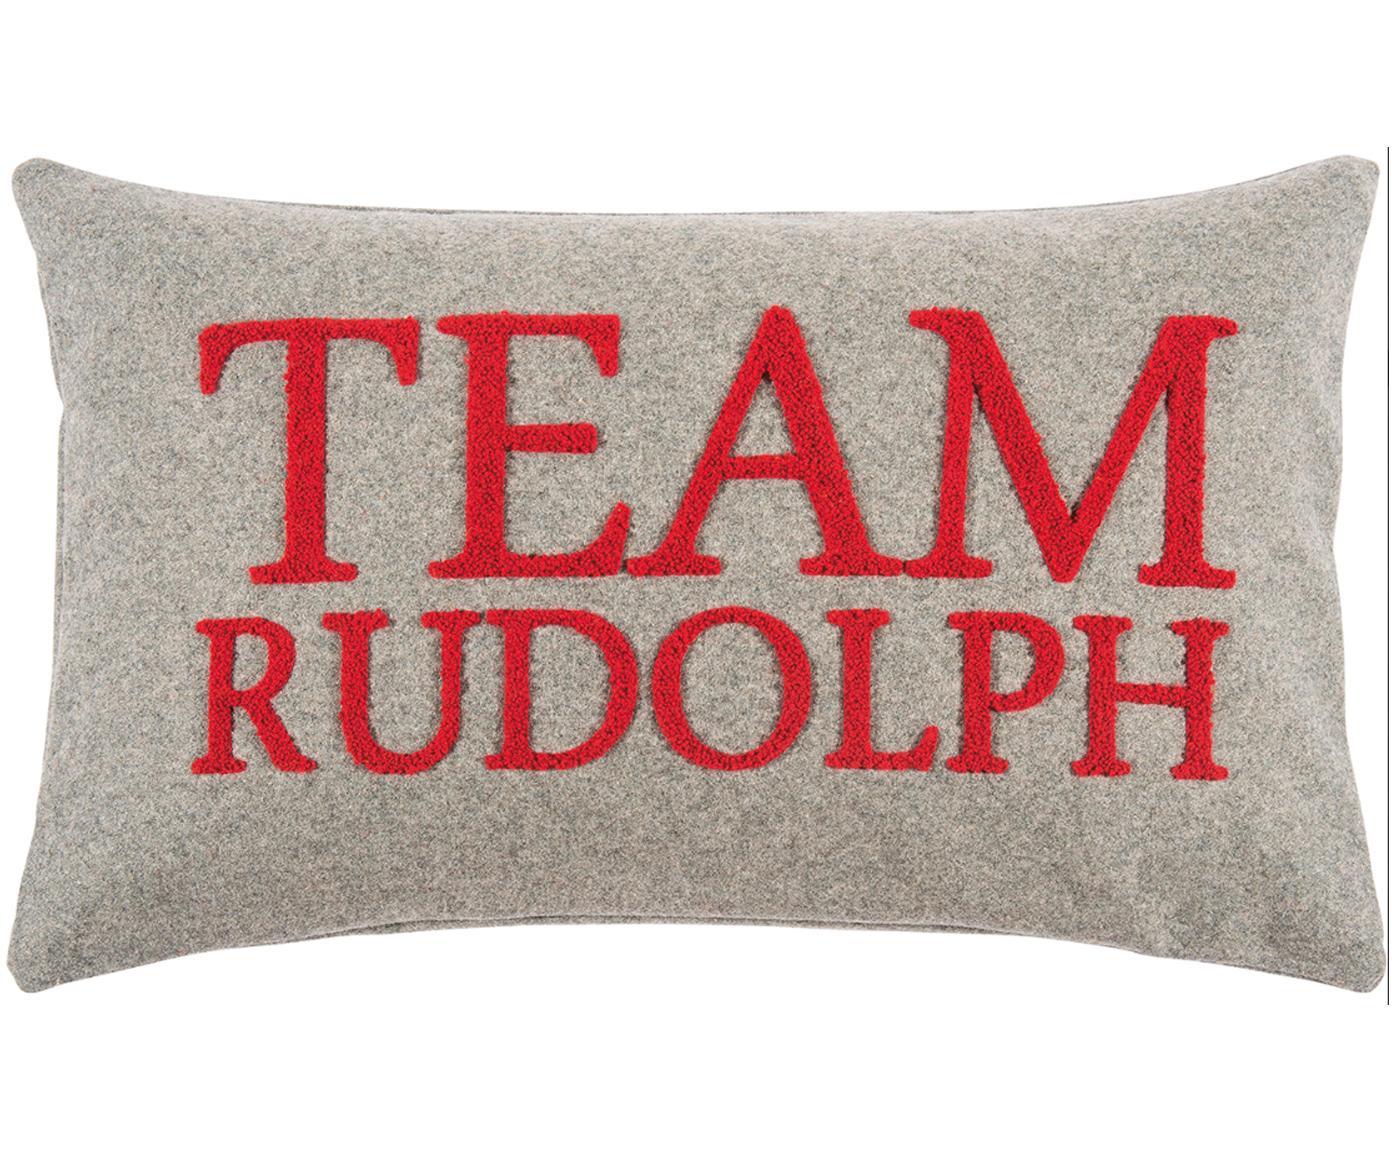 Funda de cojín Rudolph, 60%lana, 40%poliéster, Gris claro, rojo, An 30 x L 50 cm